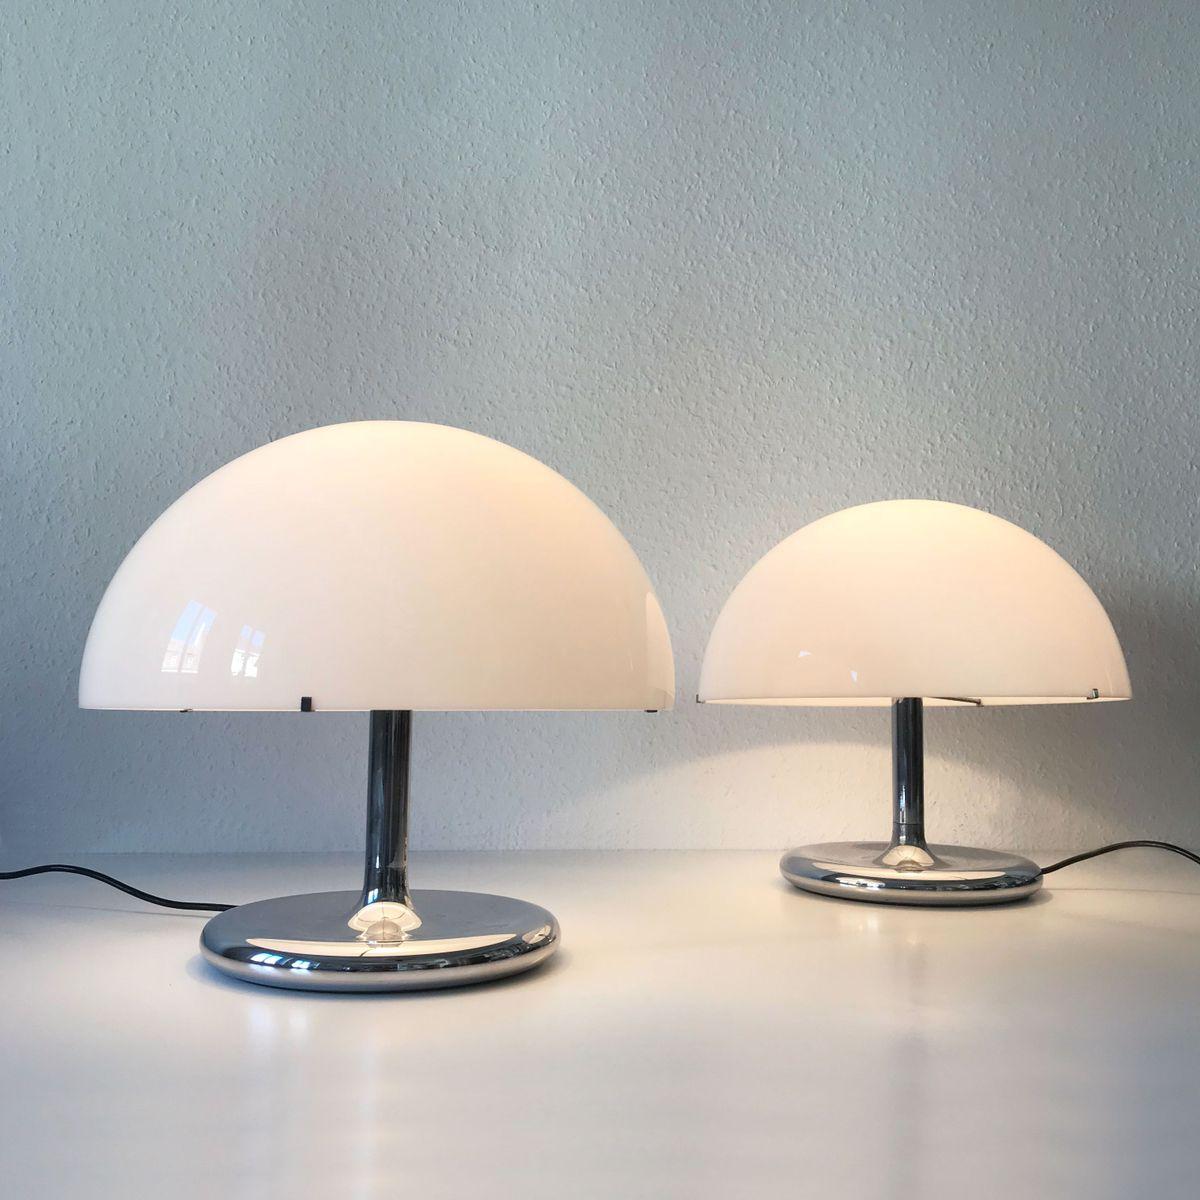 Moderne mid century lampen 1970er 2er set bei pamono kaufen for Moderne lampen